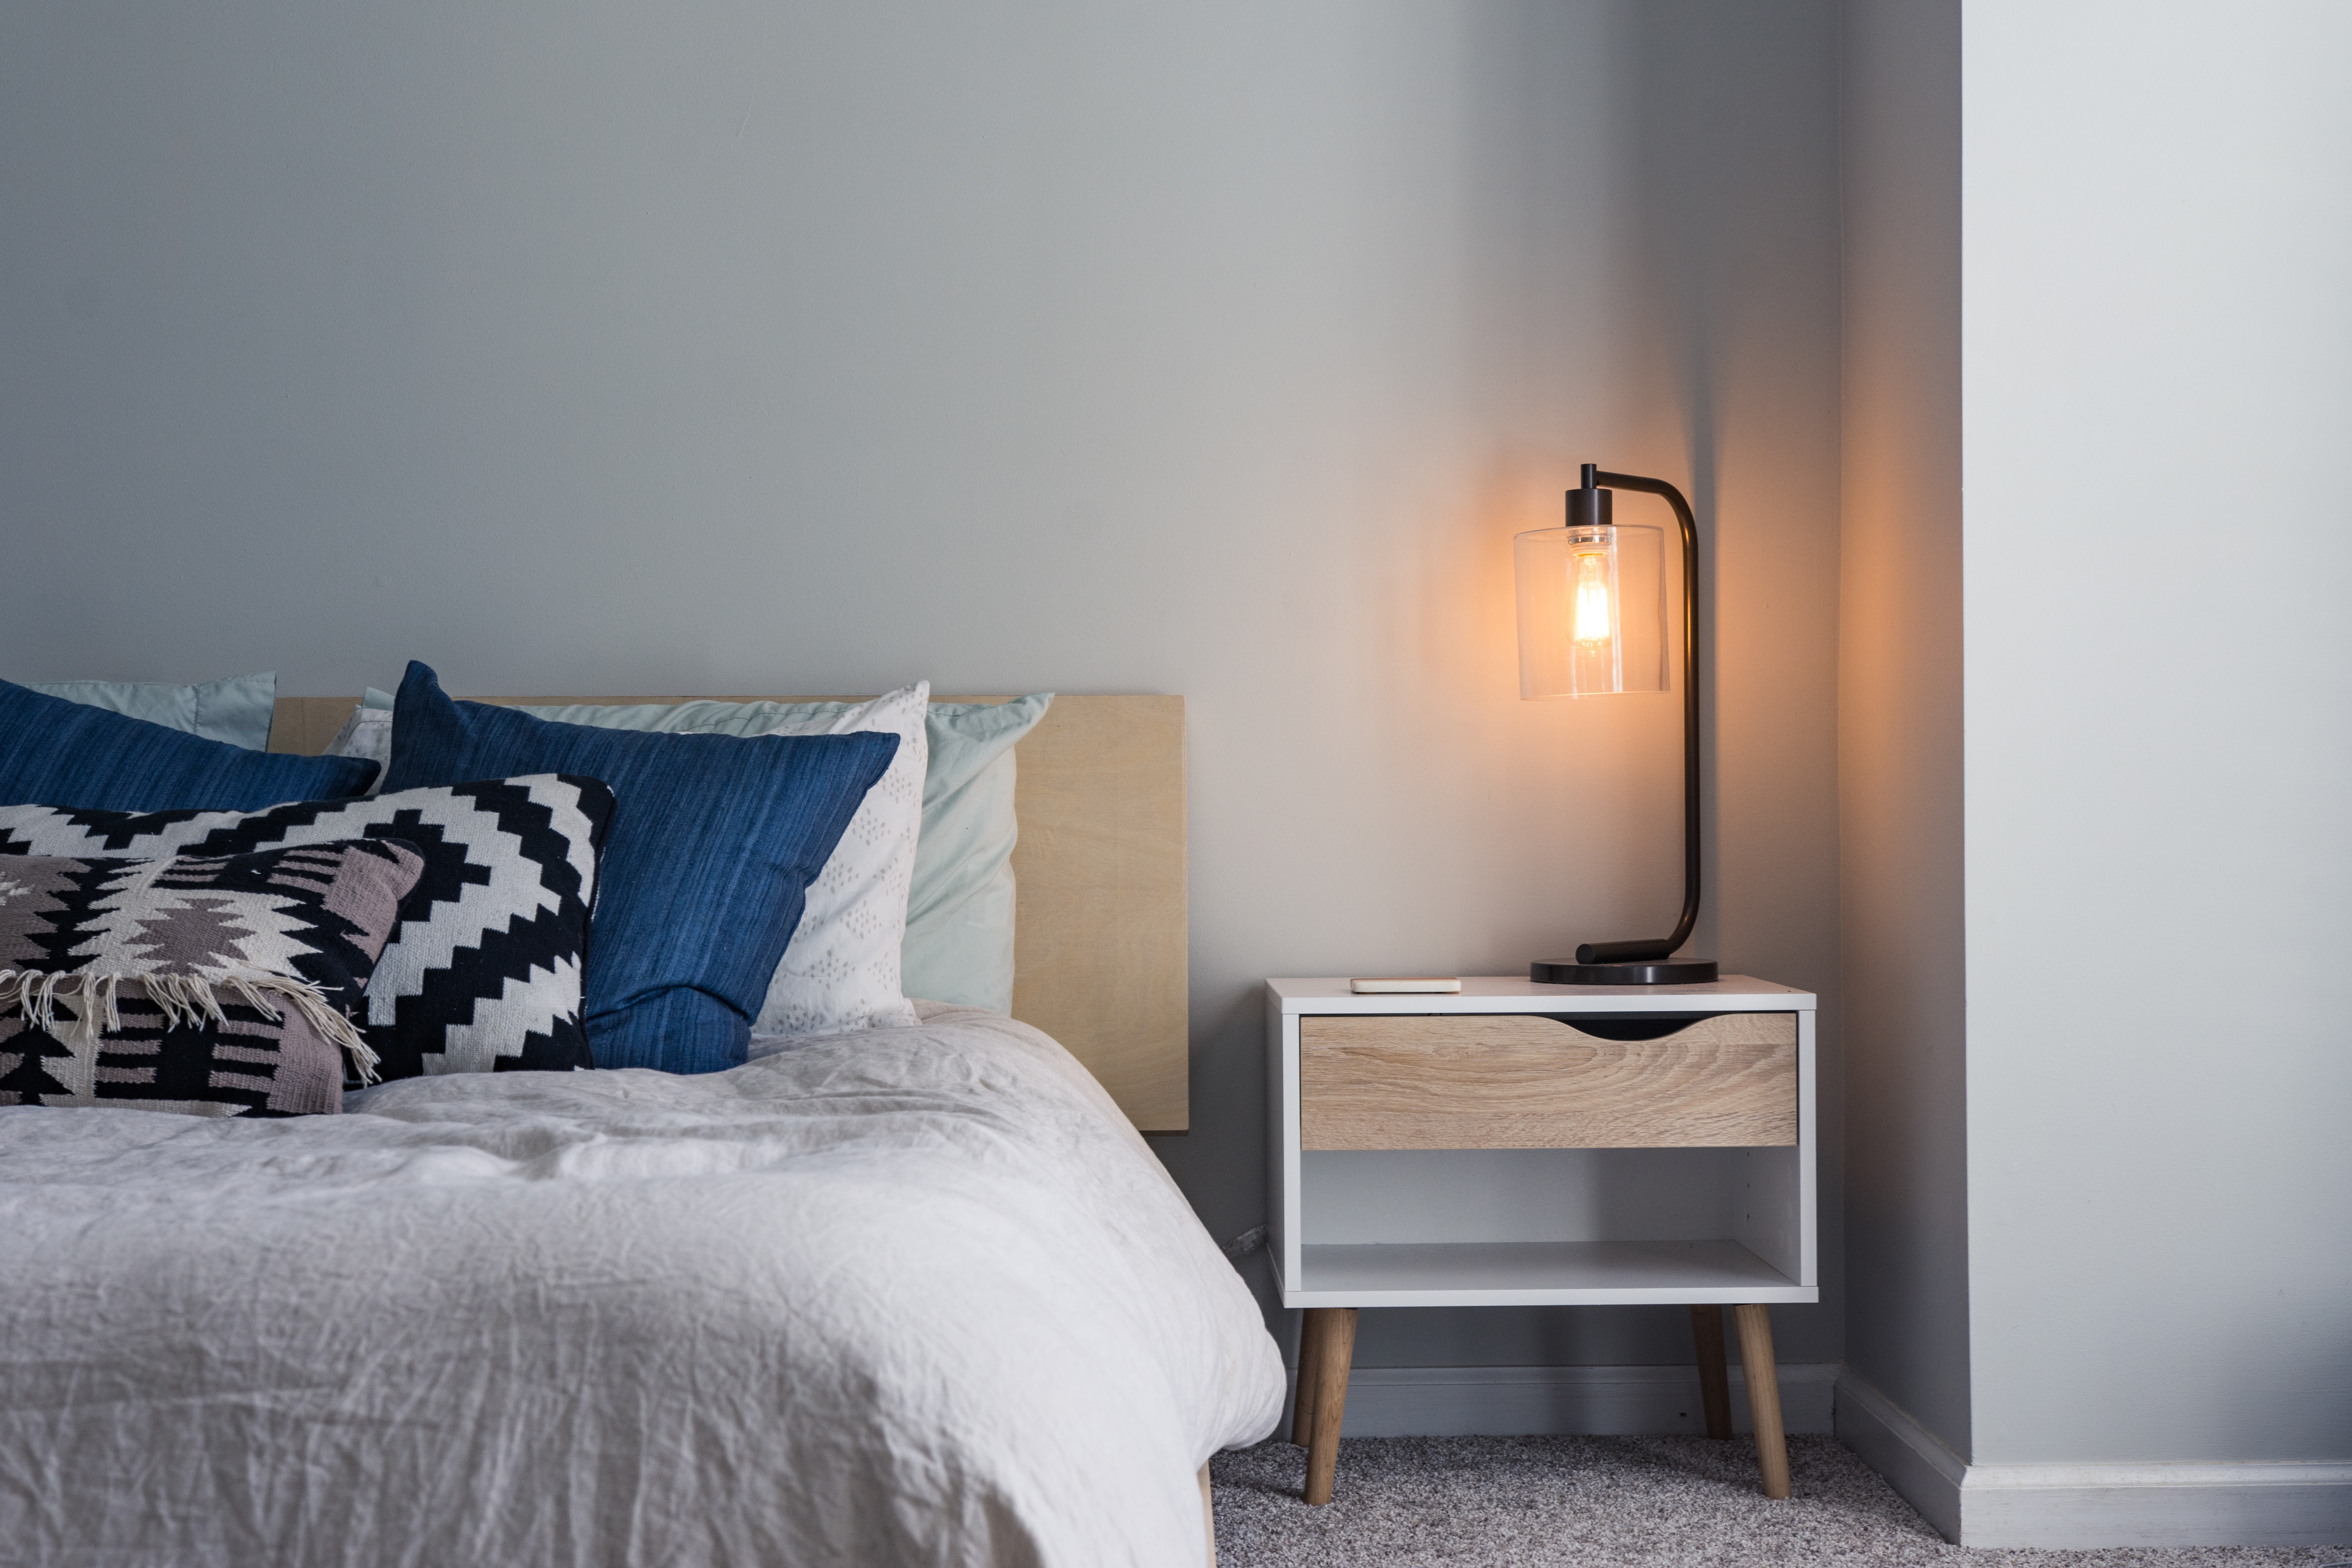 14 Ways To Make A Small Bedroom Look Bigger